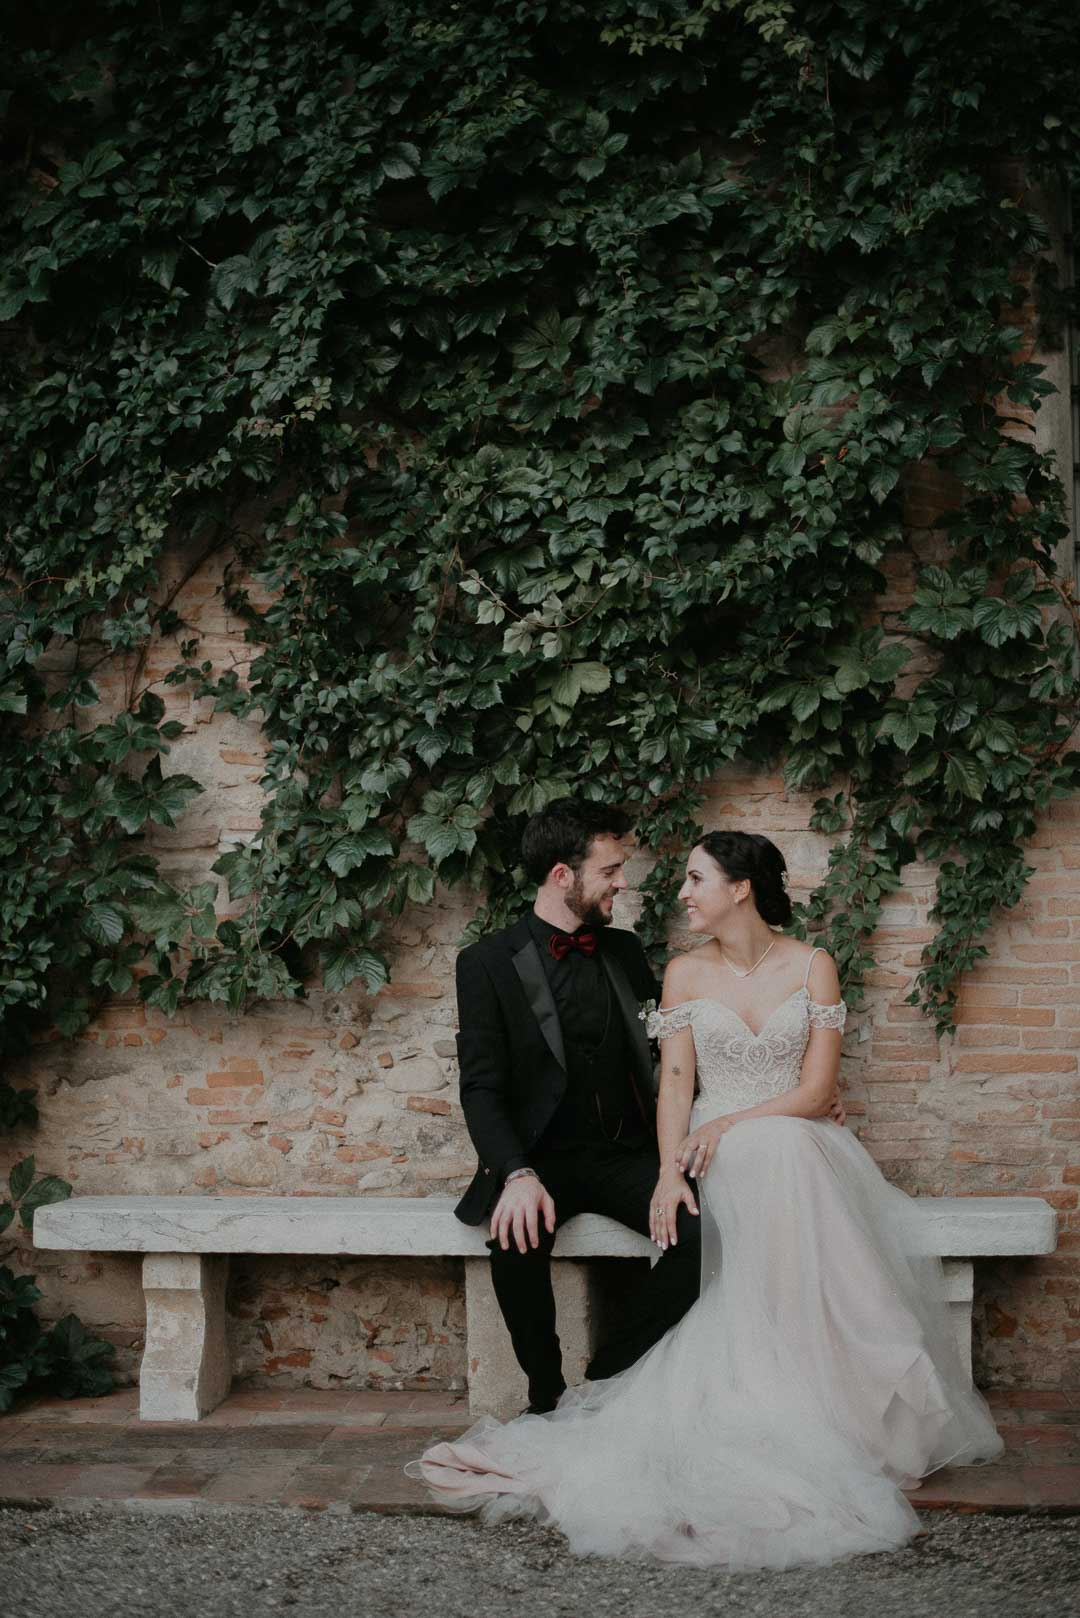 wedding-photographer-destination-fineart-bespoke-reportage-tuscany-villascorzi-vivianeizzo-spazio46-109